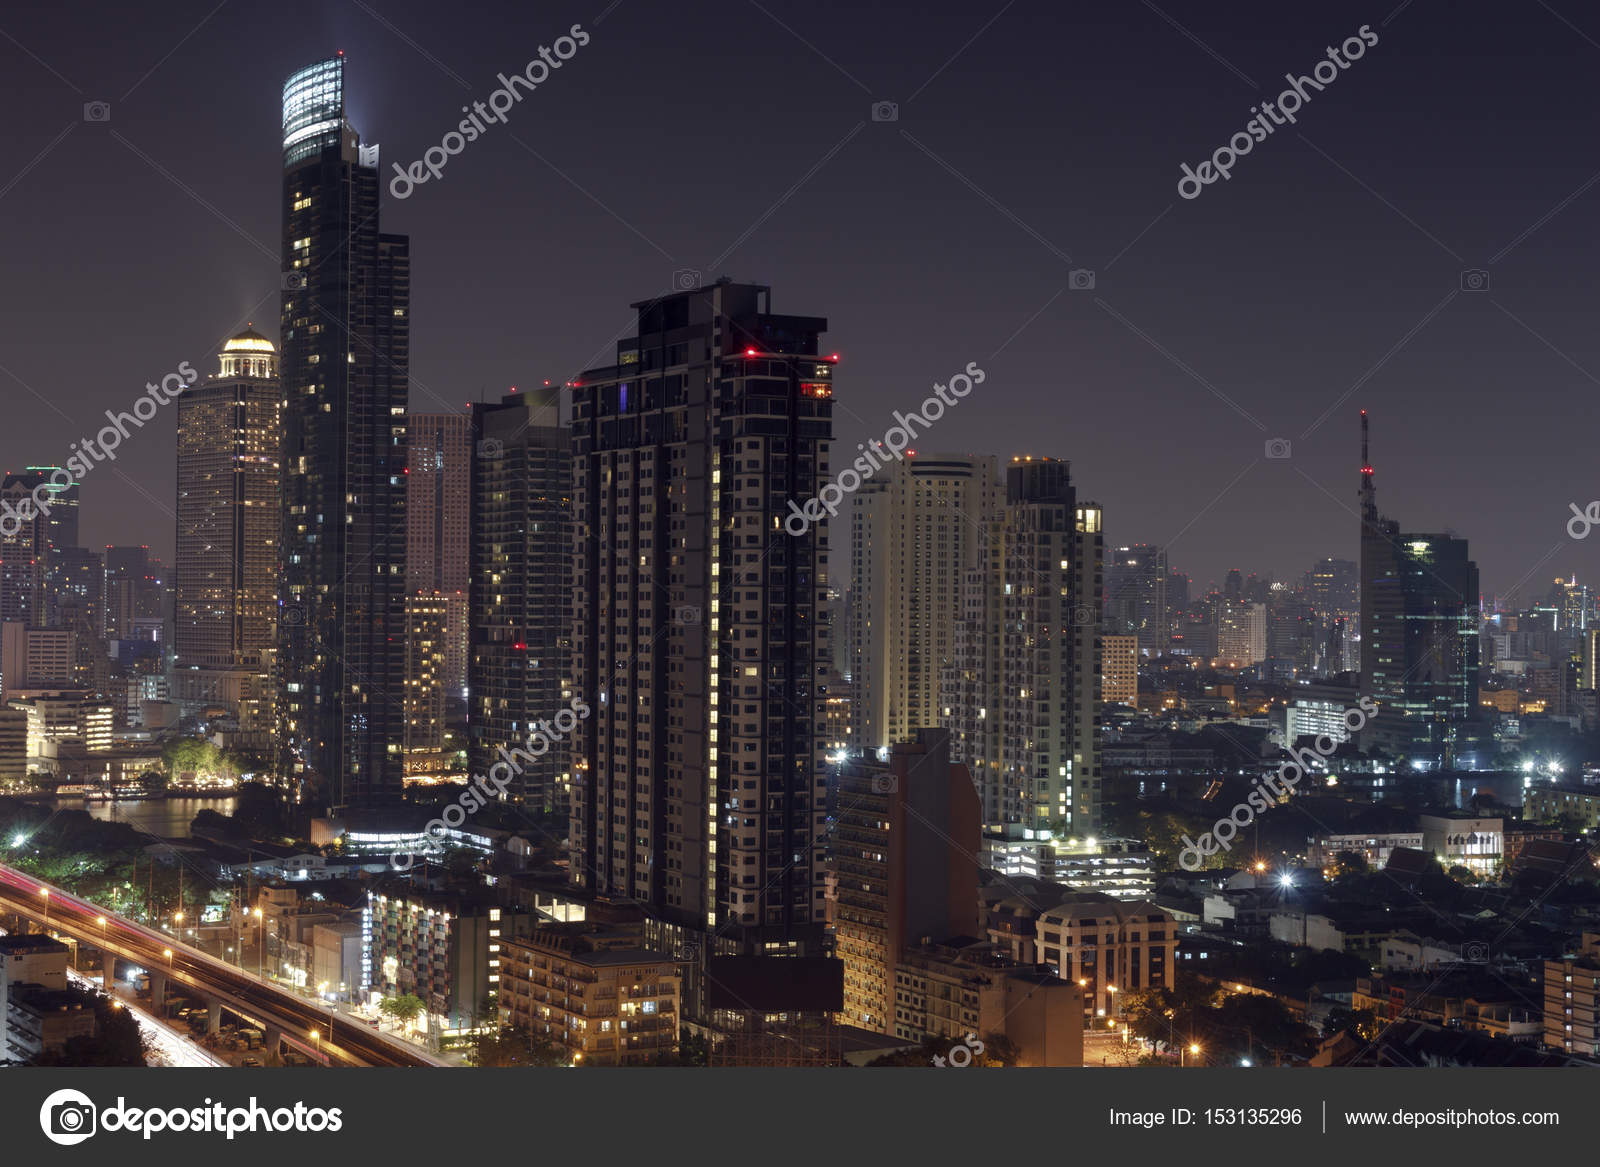 Top Wallpaper Night Abstract - depositphotos_153135296-stock-photo-abstract-downtown-night-scene-modern  Snapshot.jpg